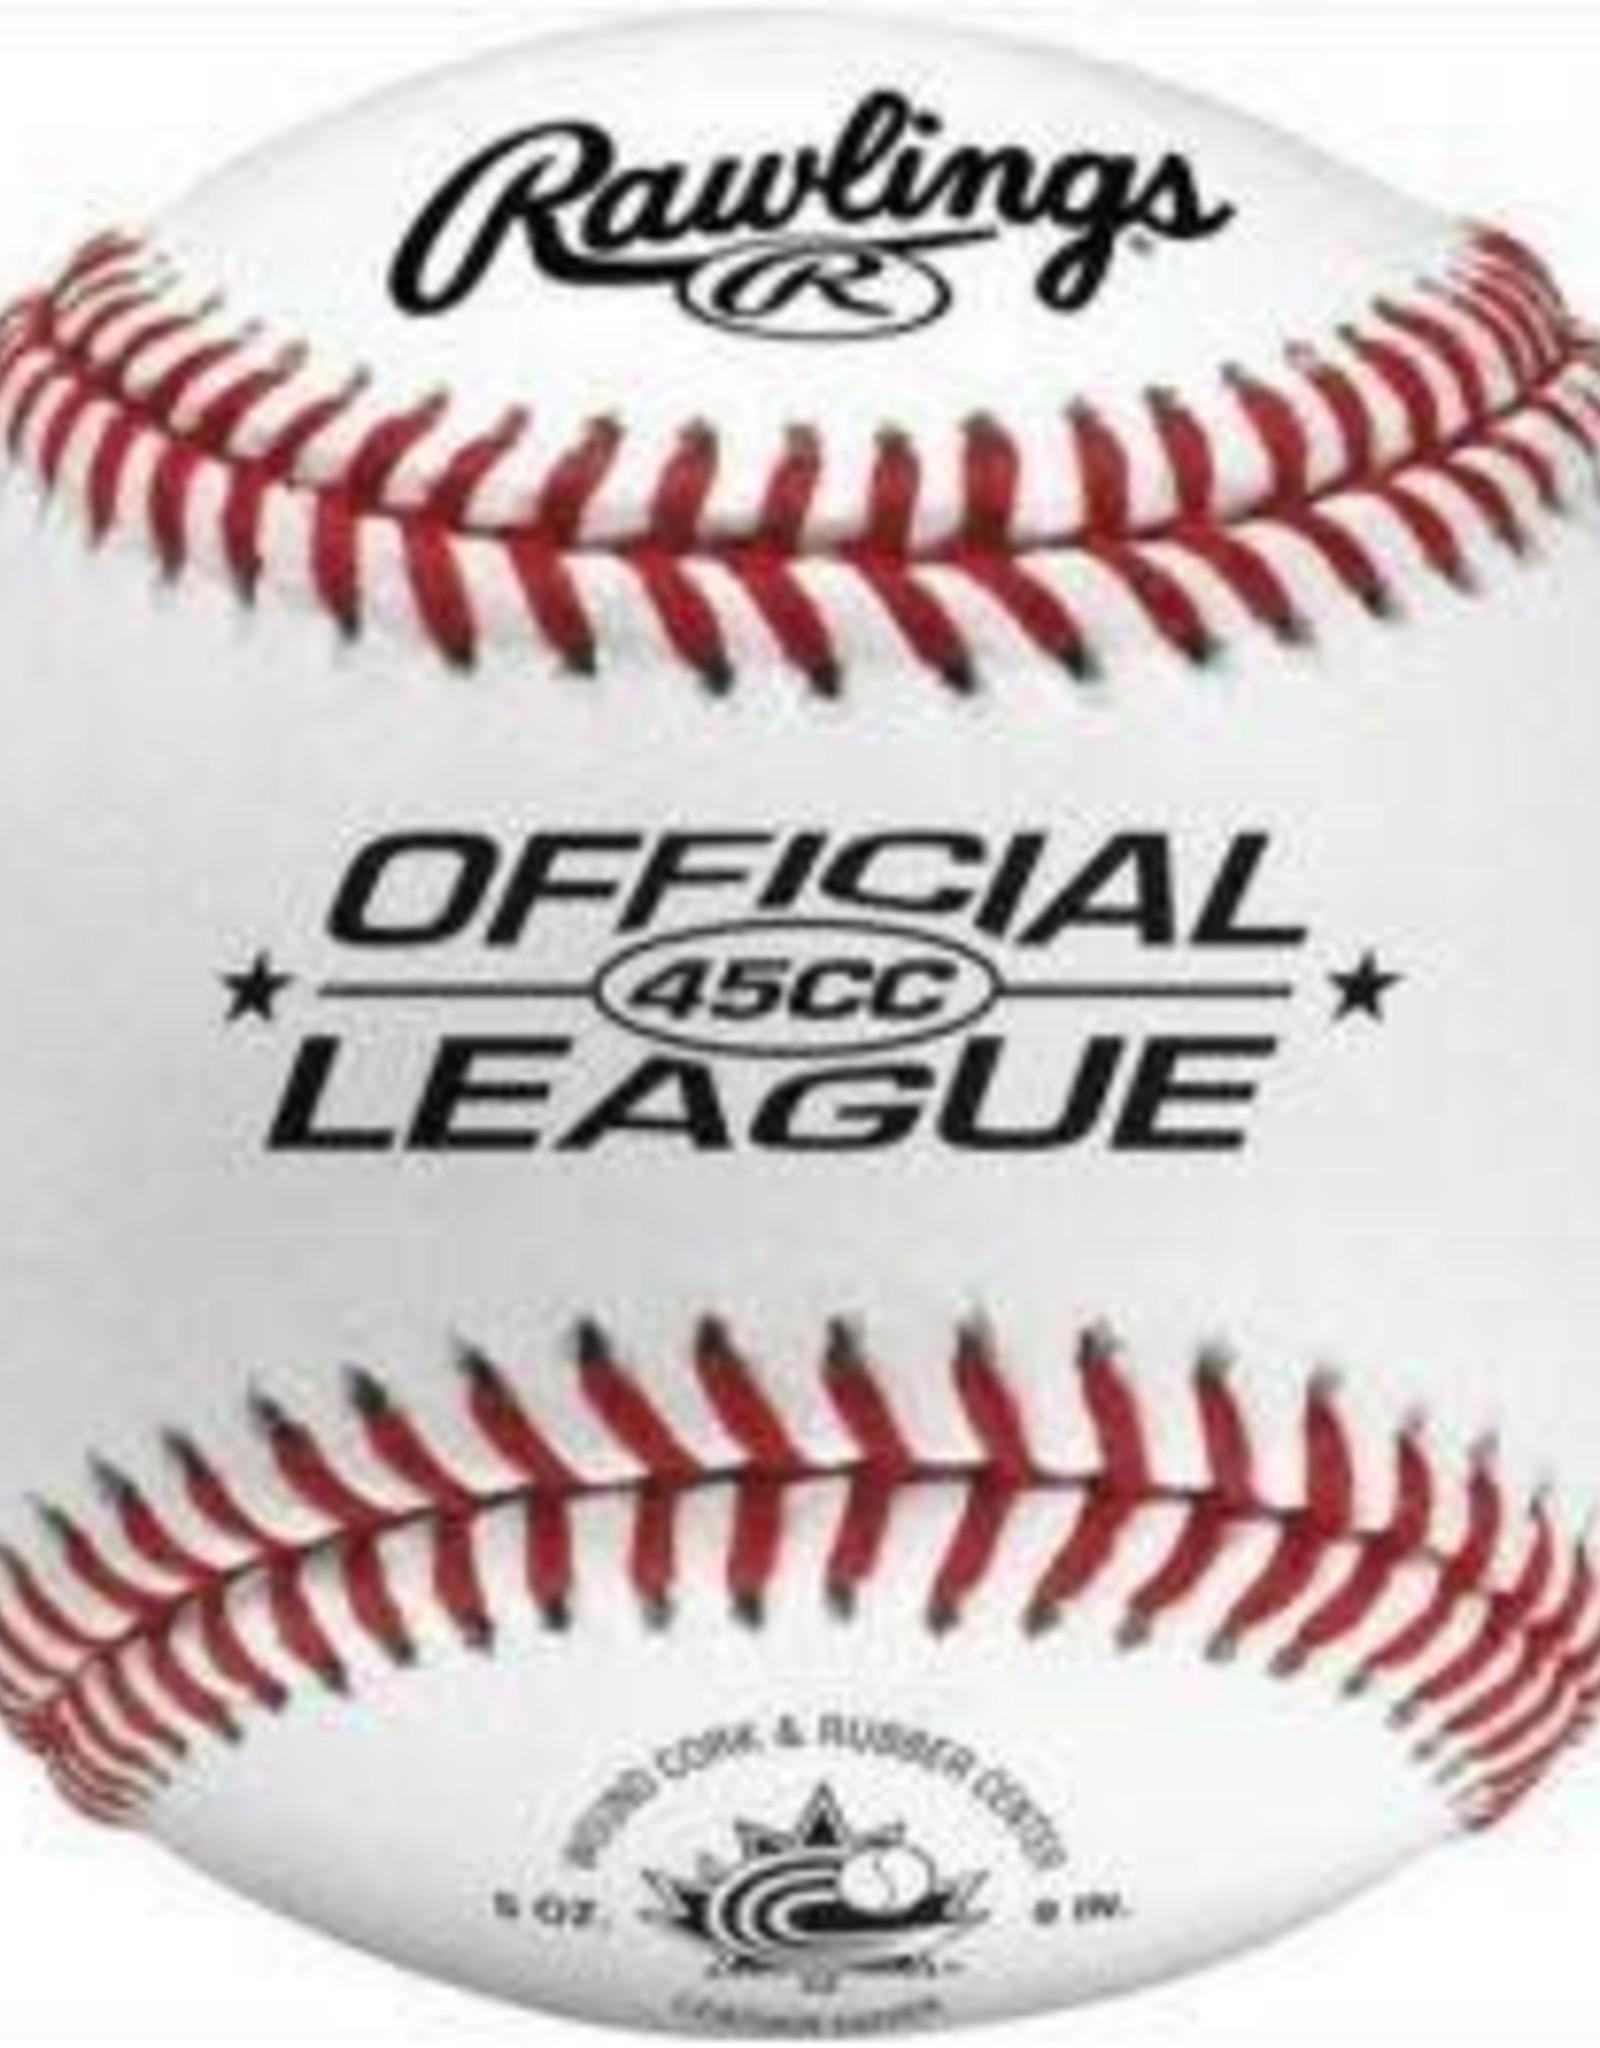 Rawlings Balle Baseball 45cc